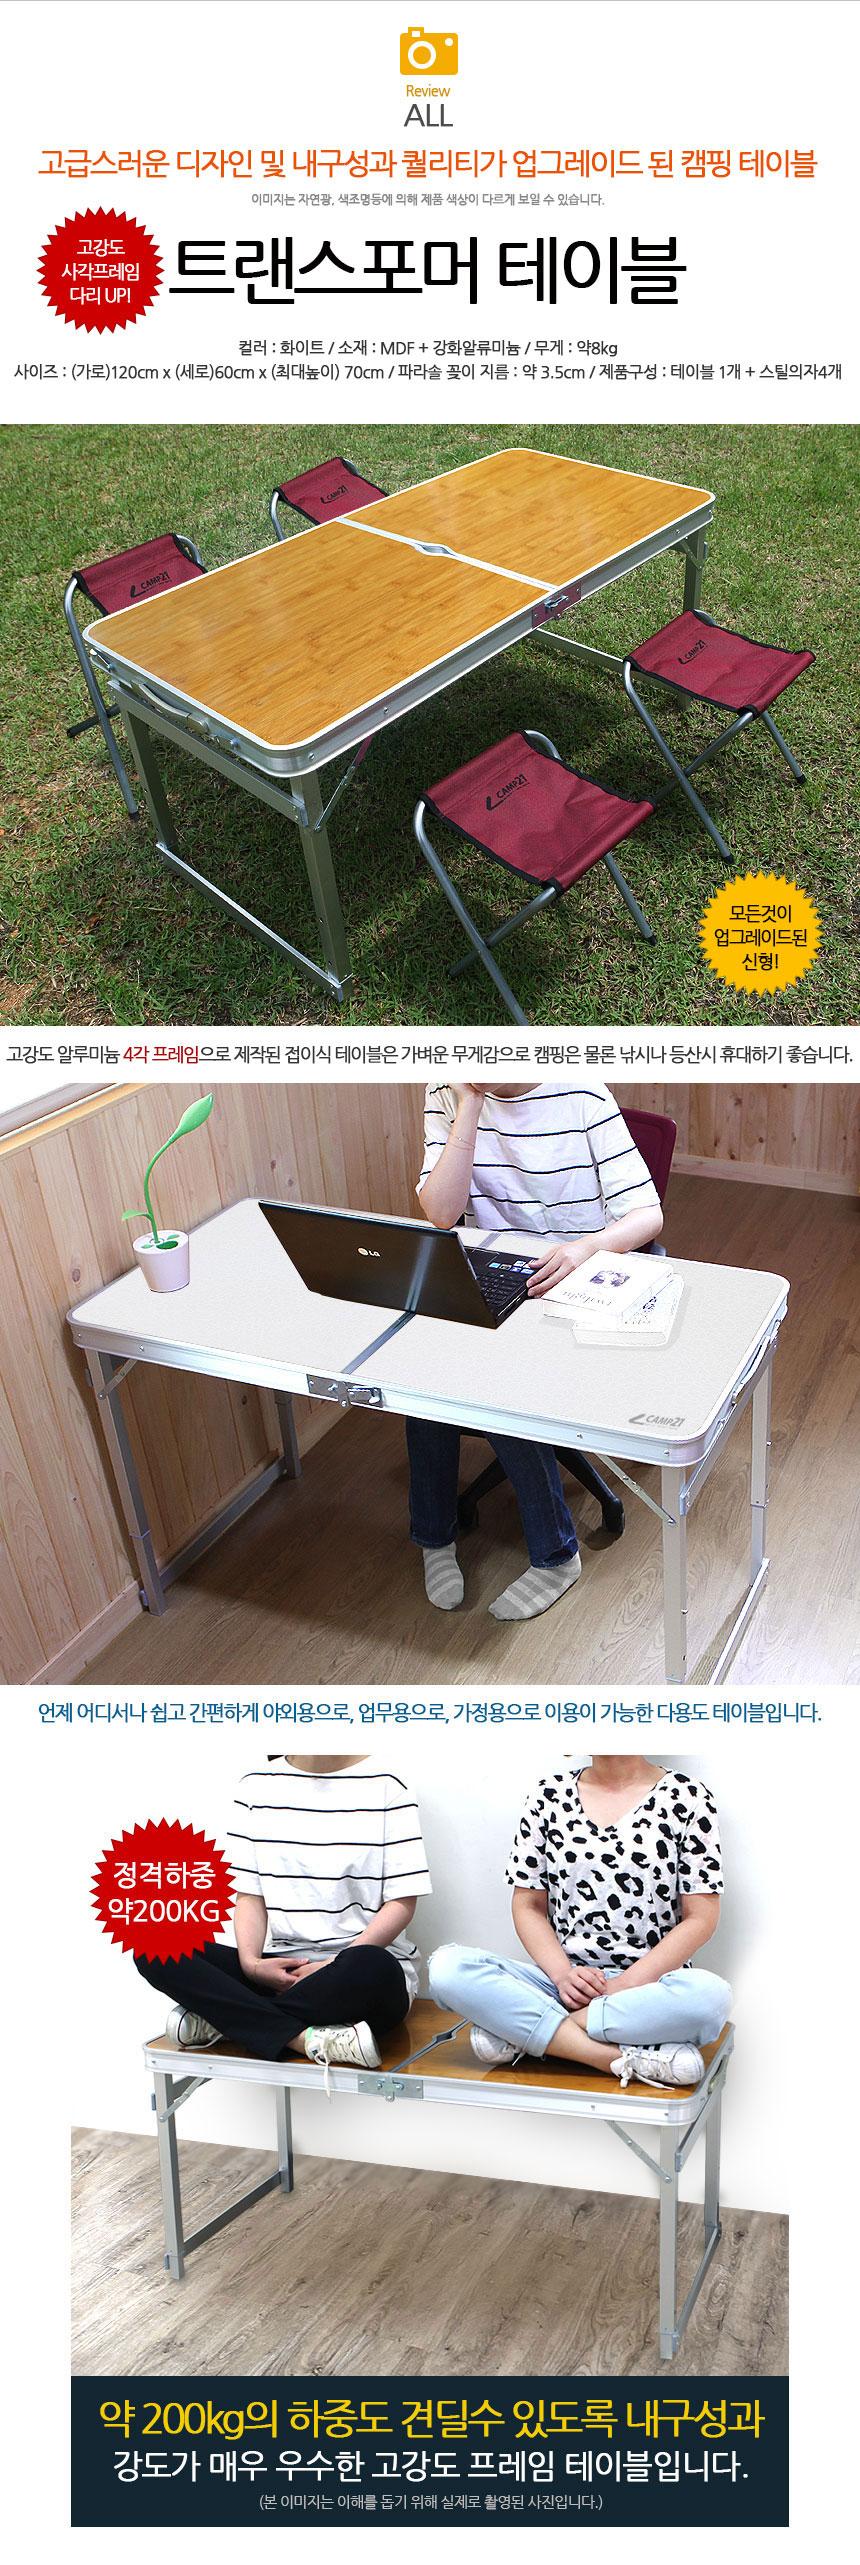 00_table_0.jpg